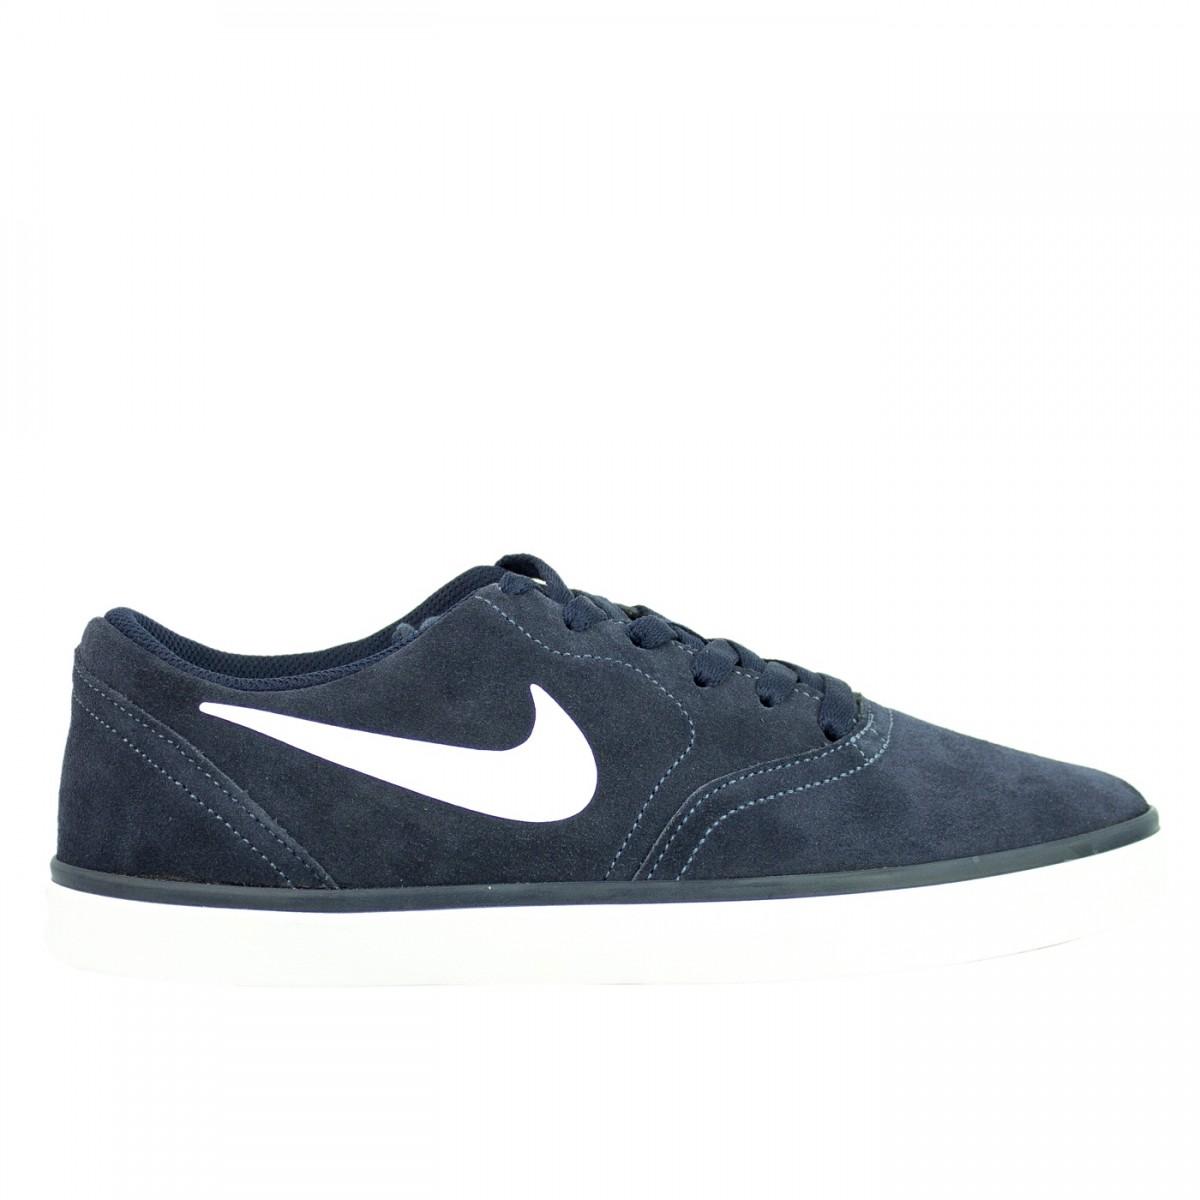 0ae641a724d Bizz Store - Tênis Masculino Nike SB Check Couro Nobuck Marinho